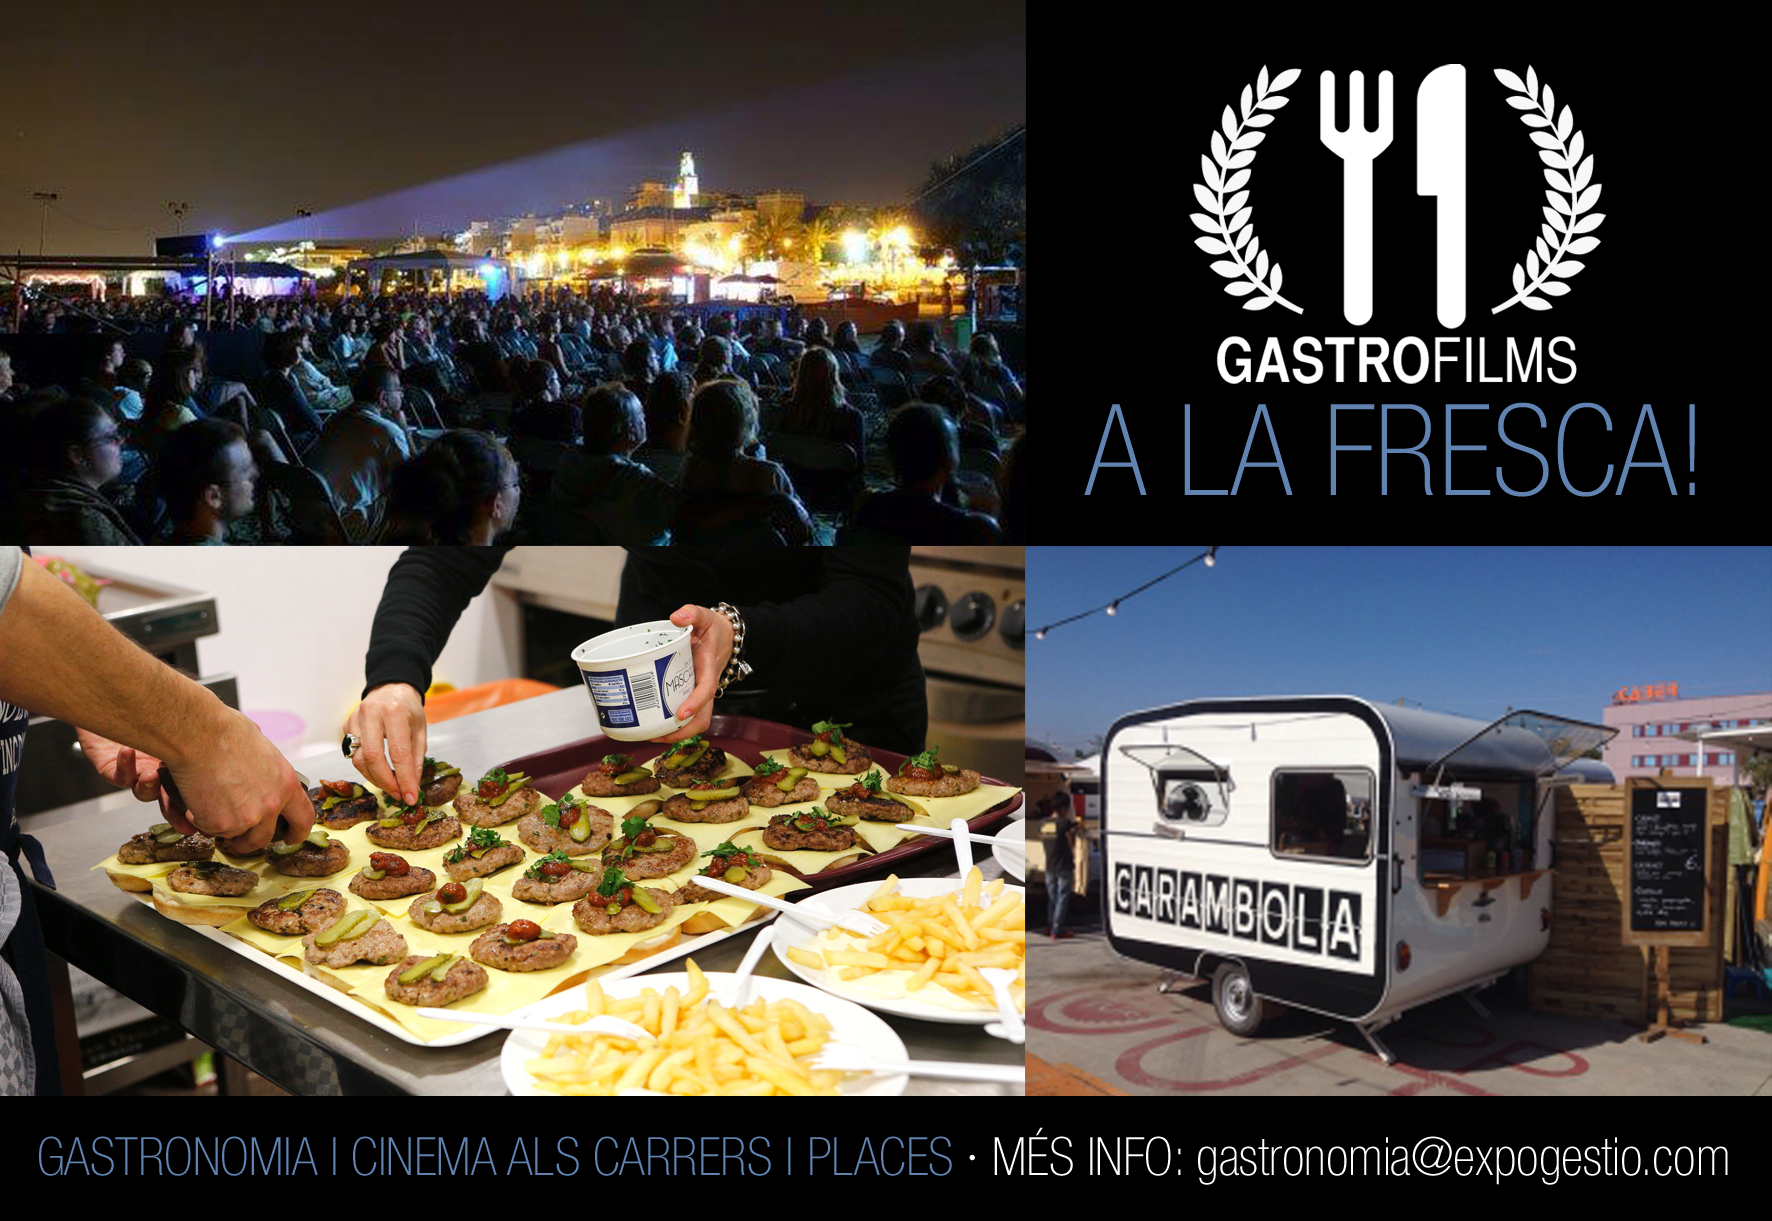 _Publi Gastrofilms a la Fresca